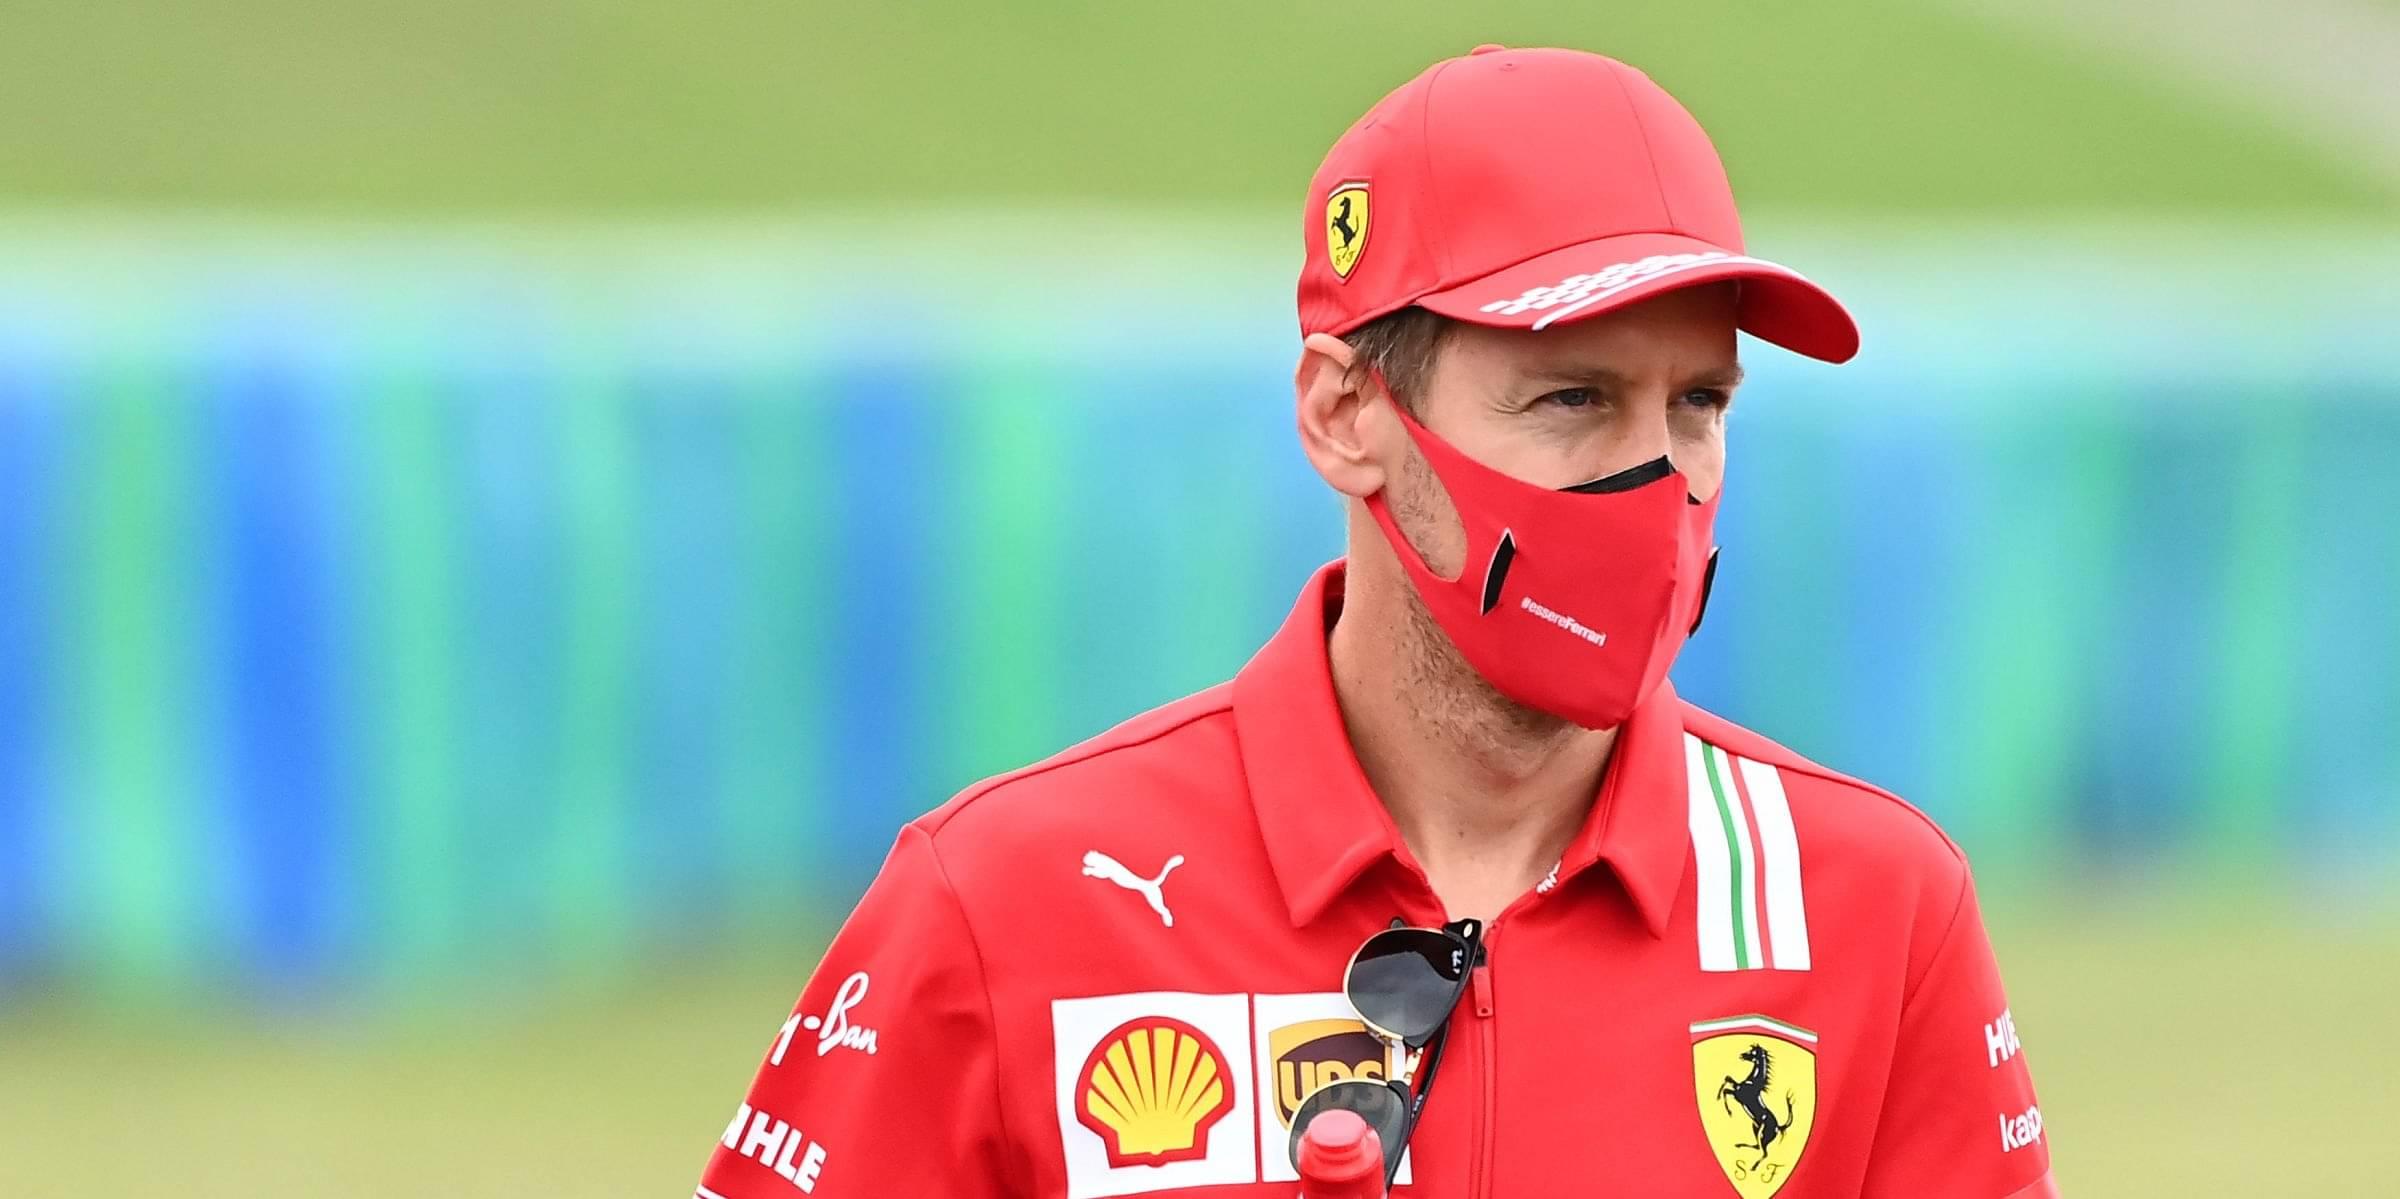 """The change in leadership from Maurizio to Mattia"" - Sebastian Vettel highlights the turning point of his Ferrari tenure"